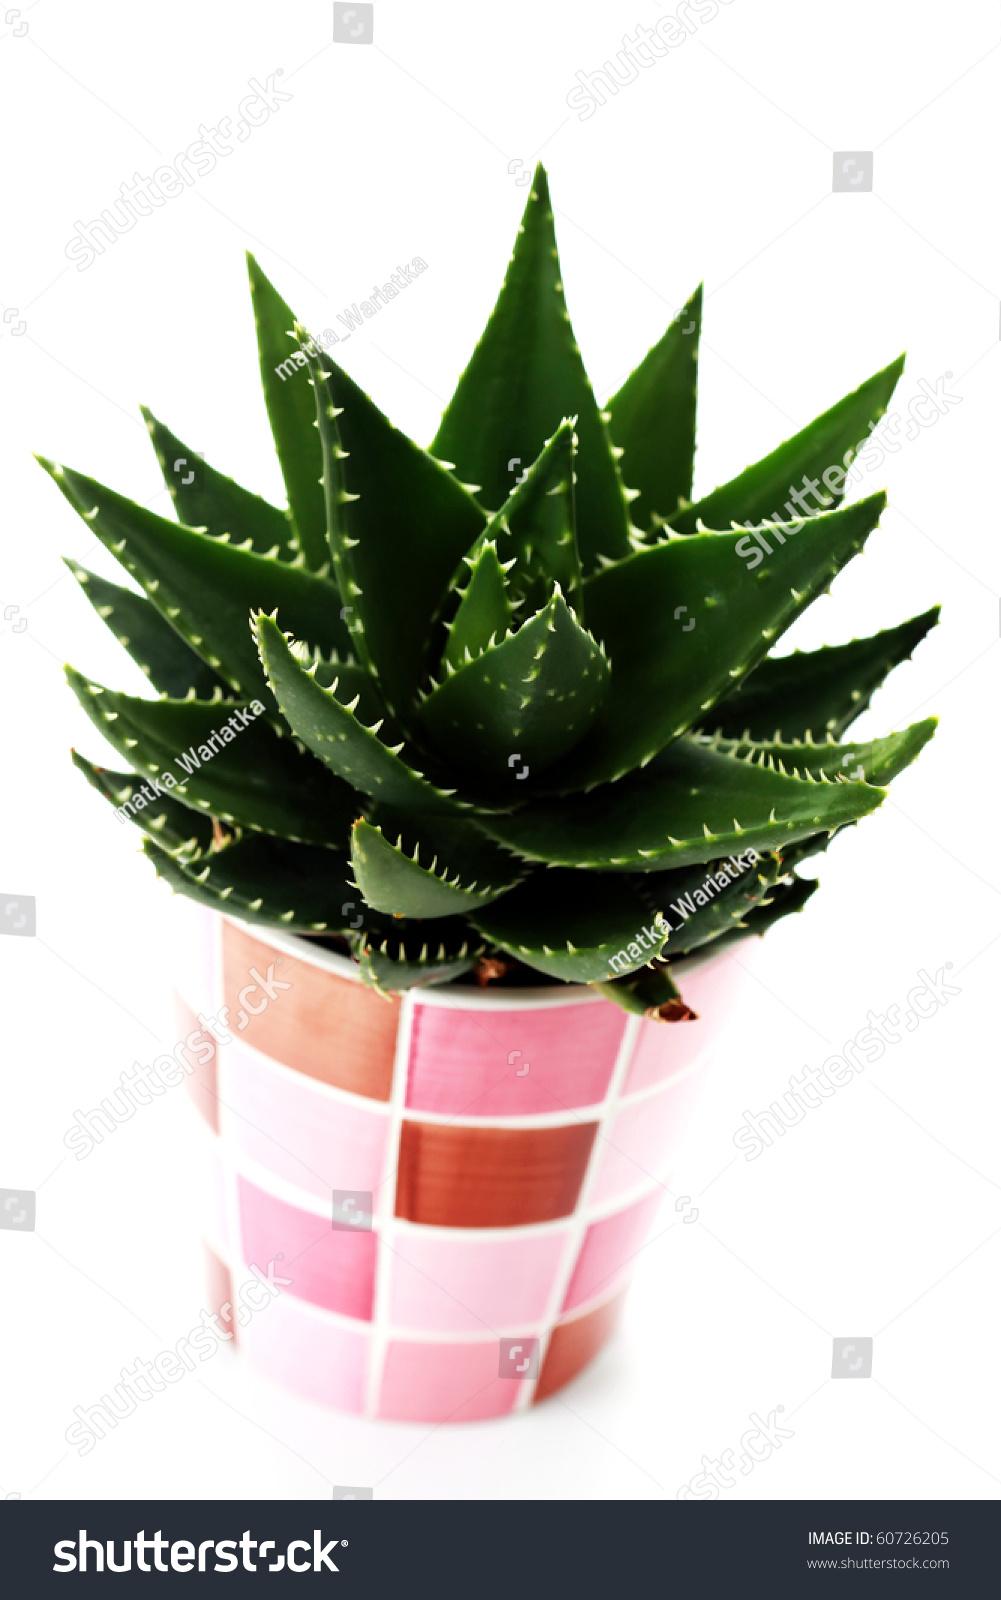 closeups aloe vera plant on white stock photo 60726205 shutterstock. Black Bedroom Furniture Sets. Home Design Ideas